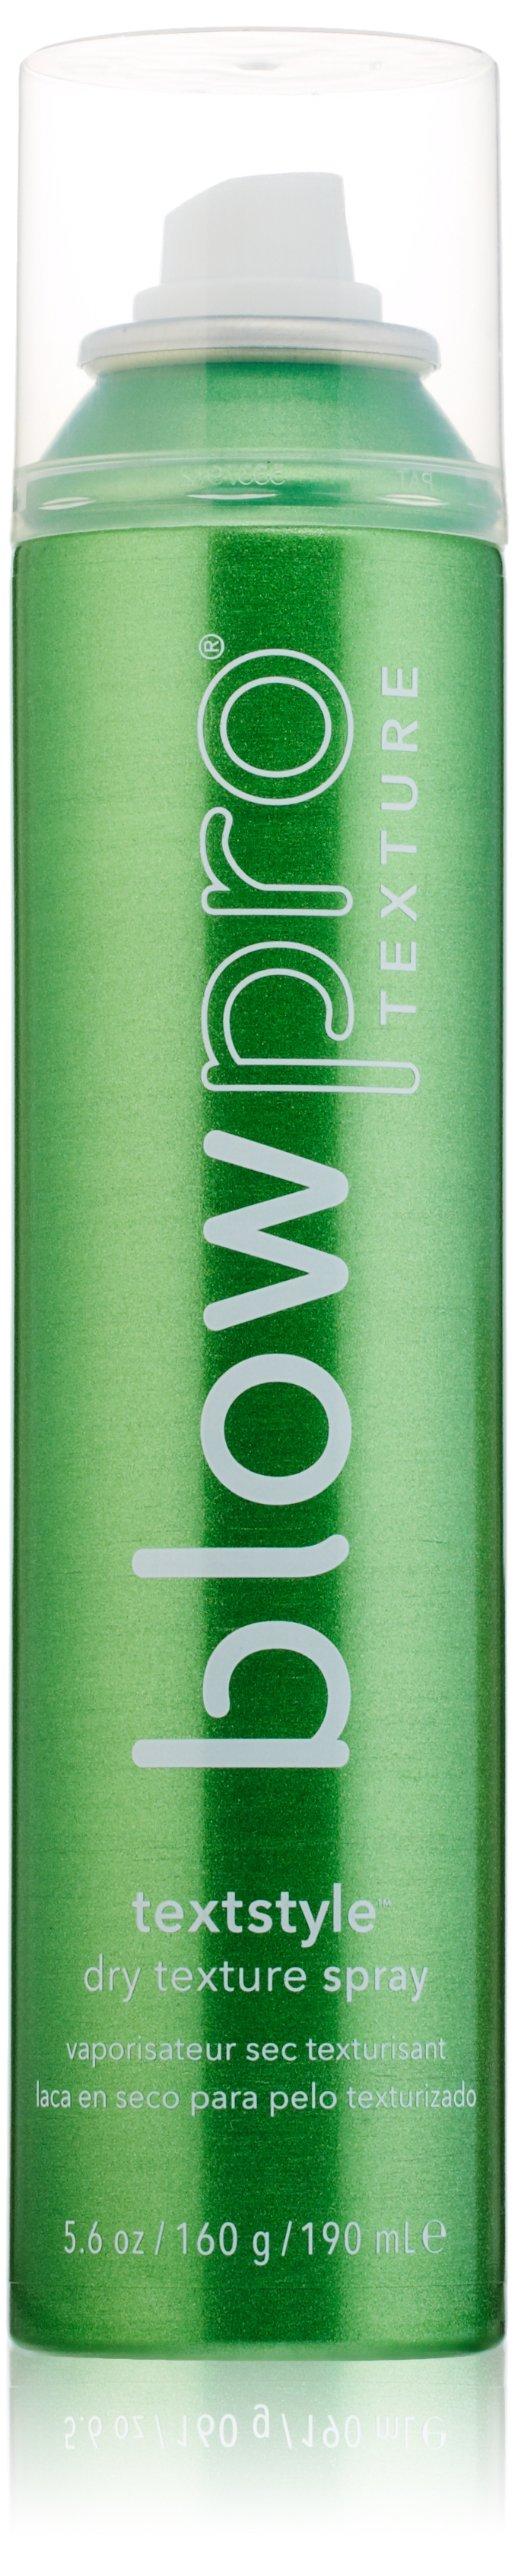 blowpro Textstyle Dry Texture Spray